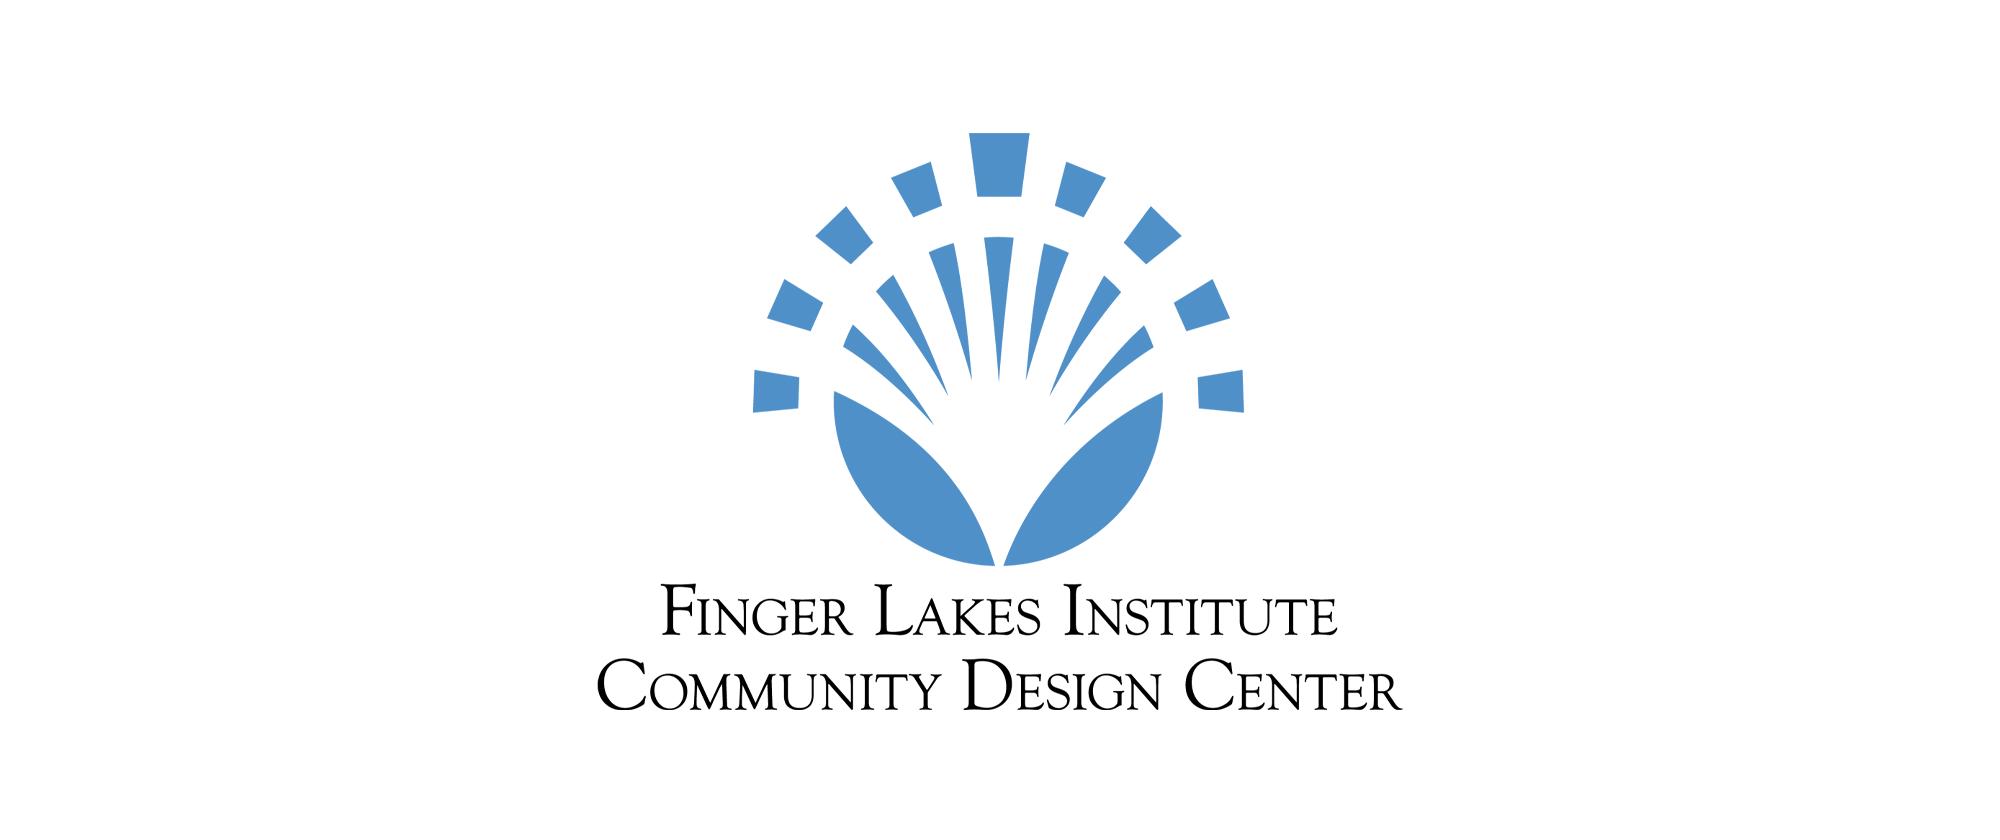 Finger Lakes Institute Community Design Center